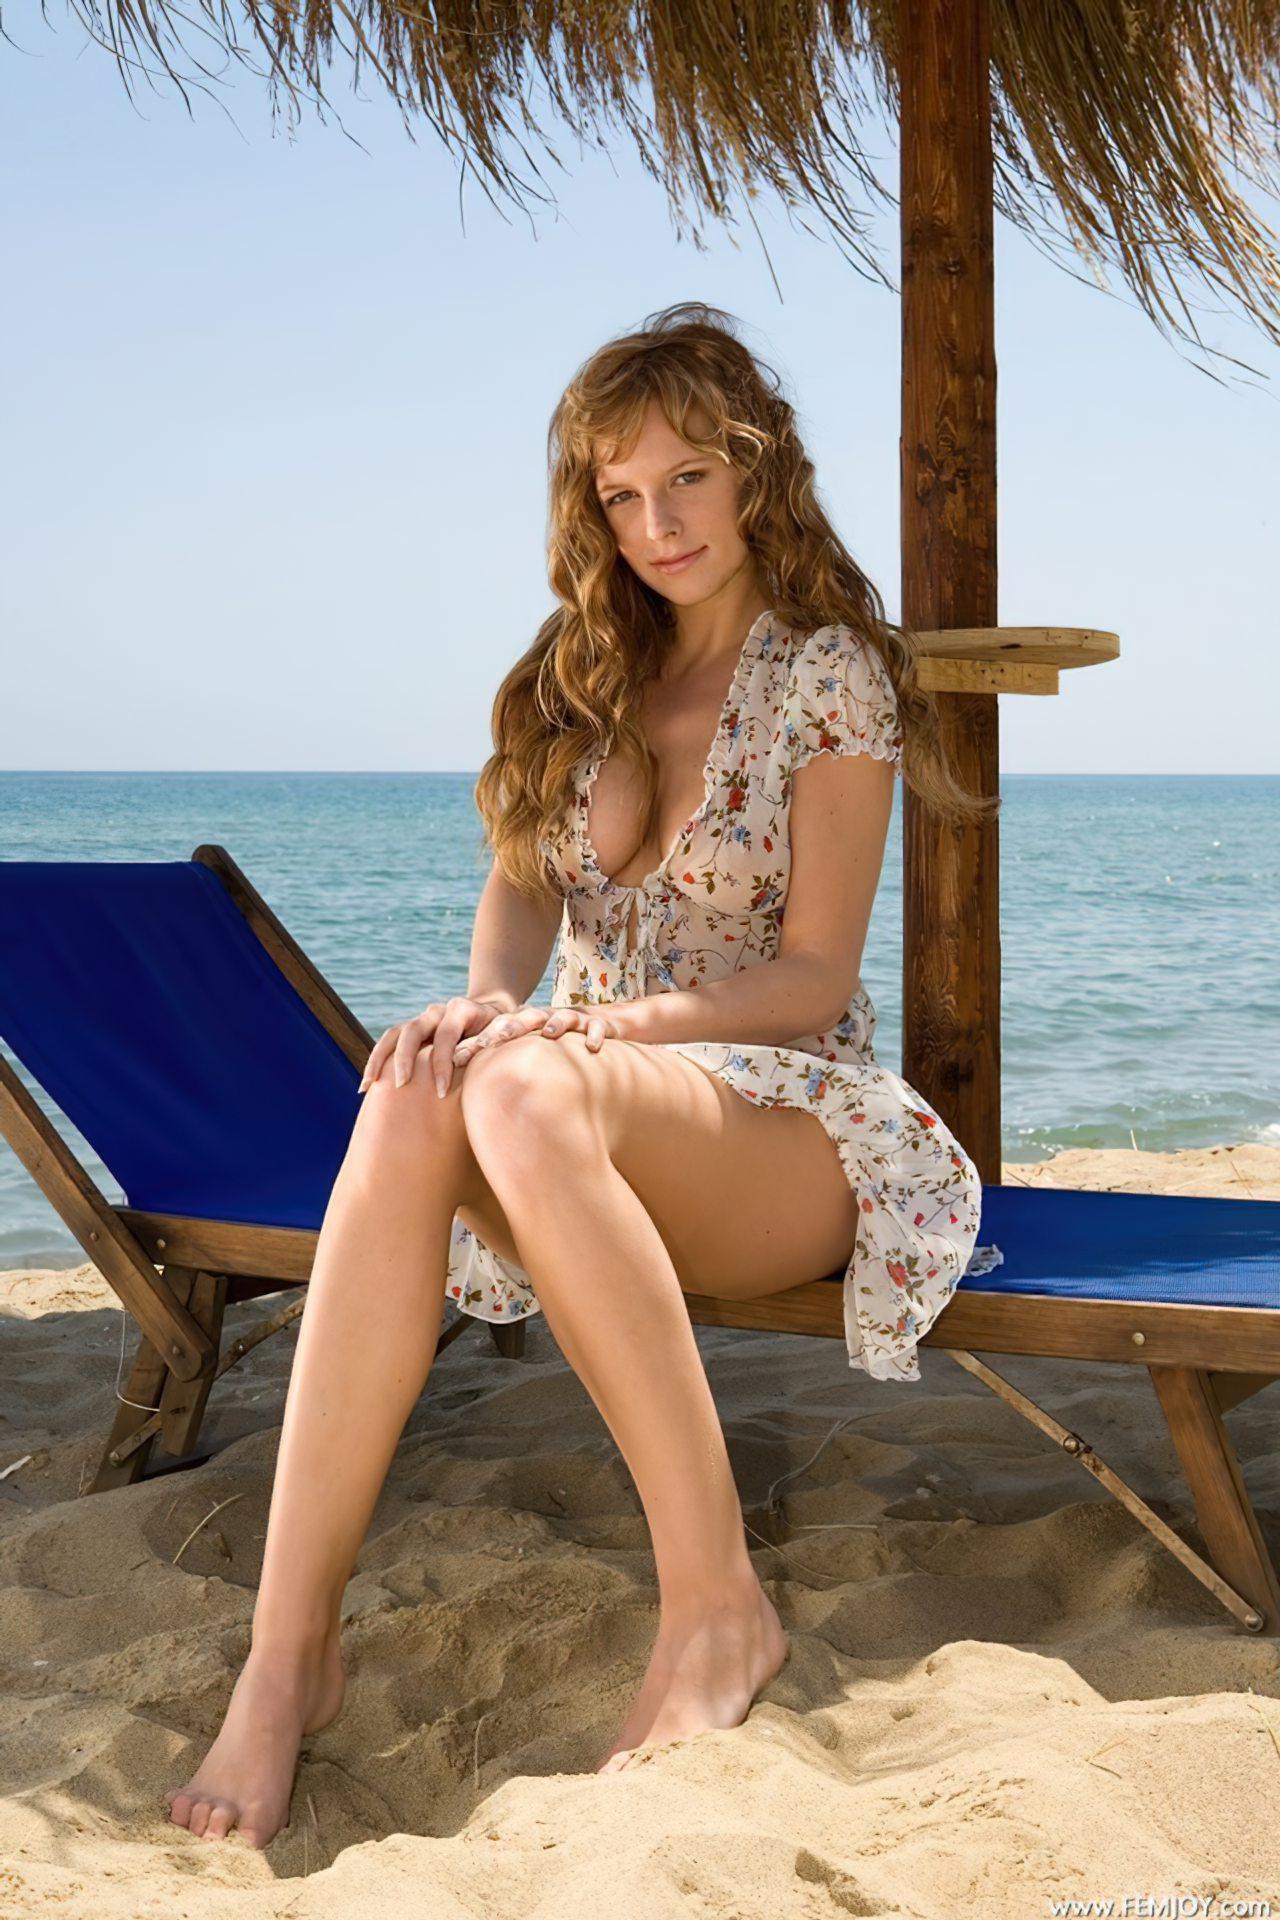 Mulher Linda Praia Tropical (1)